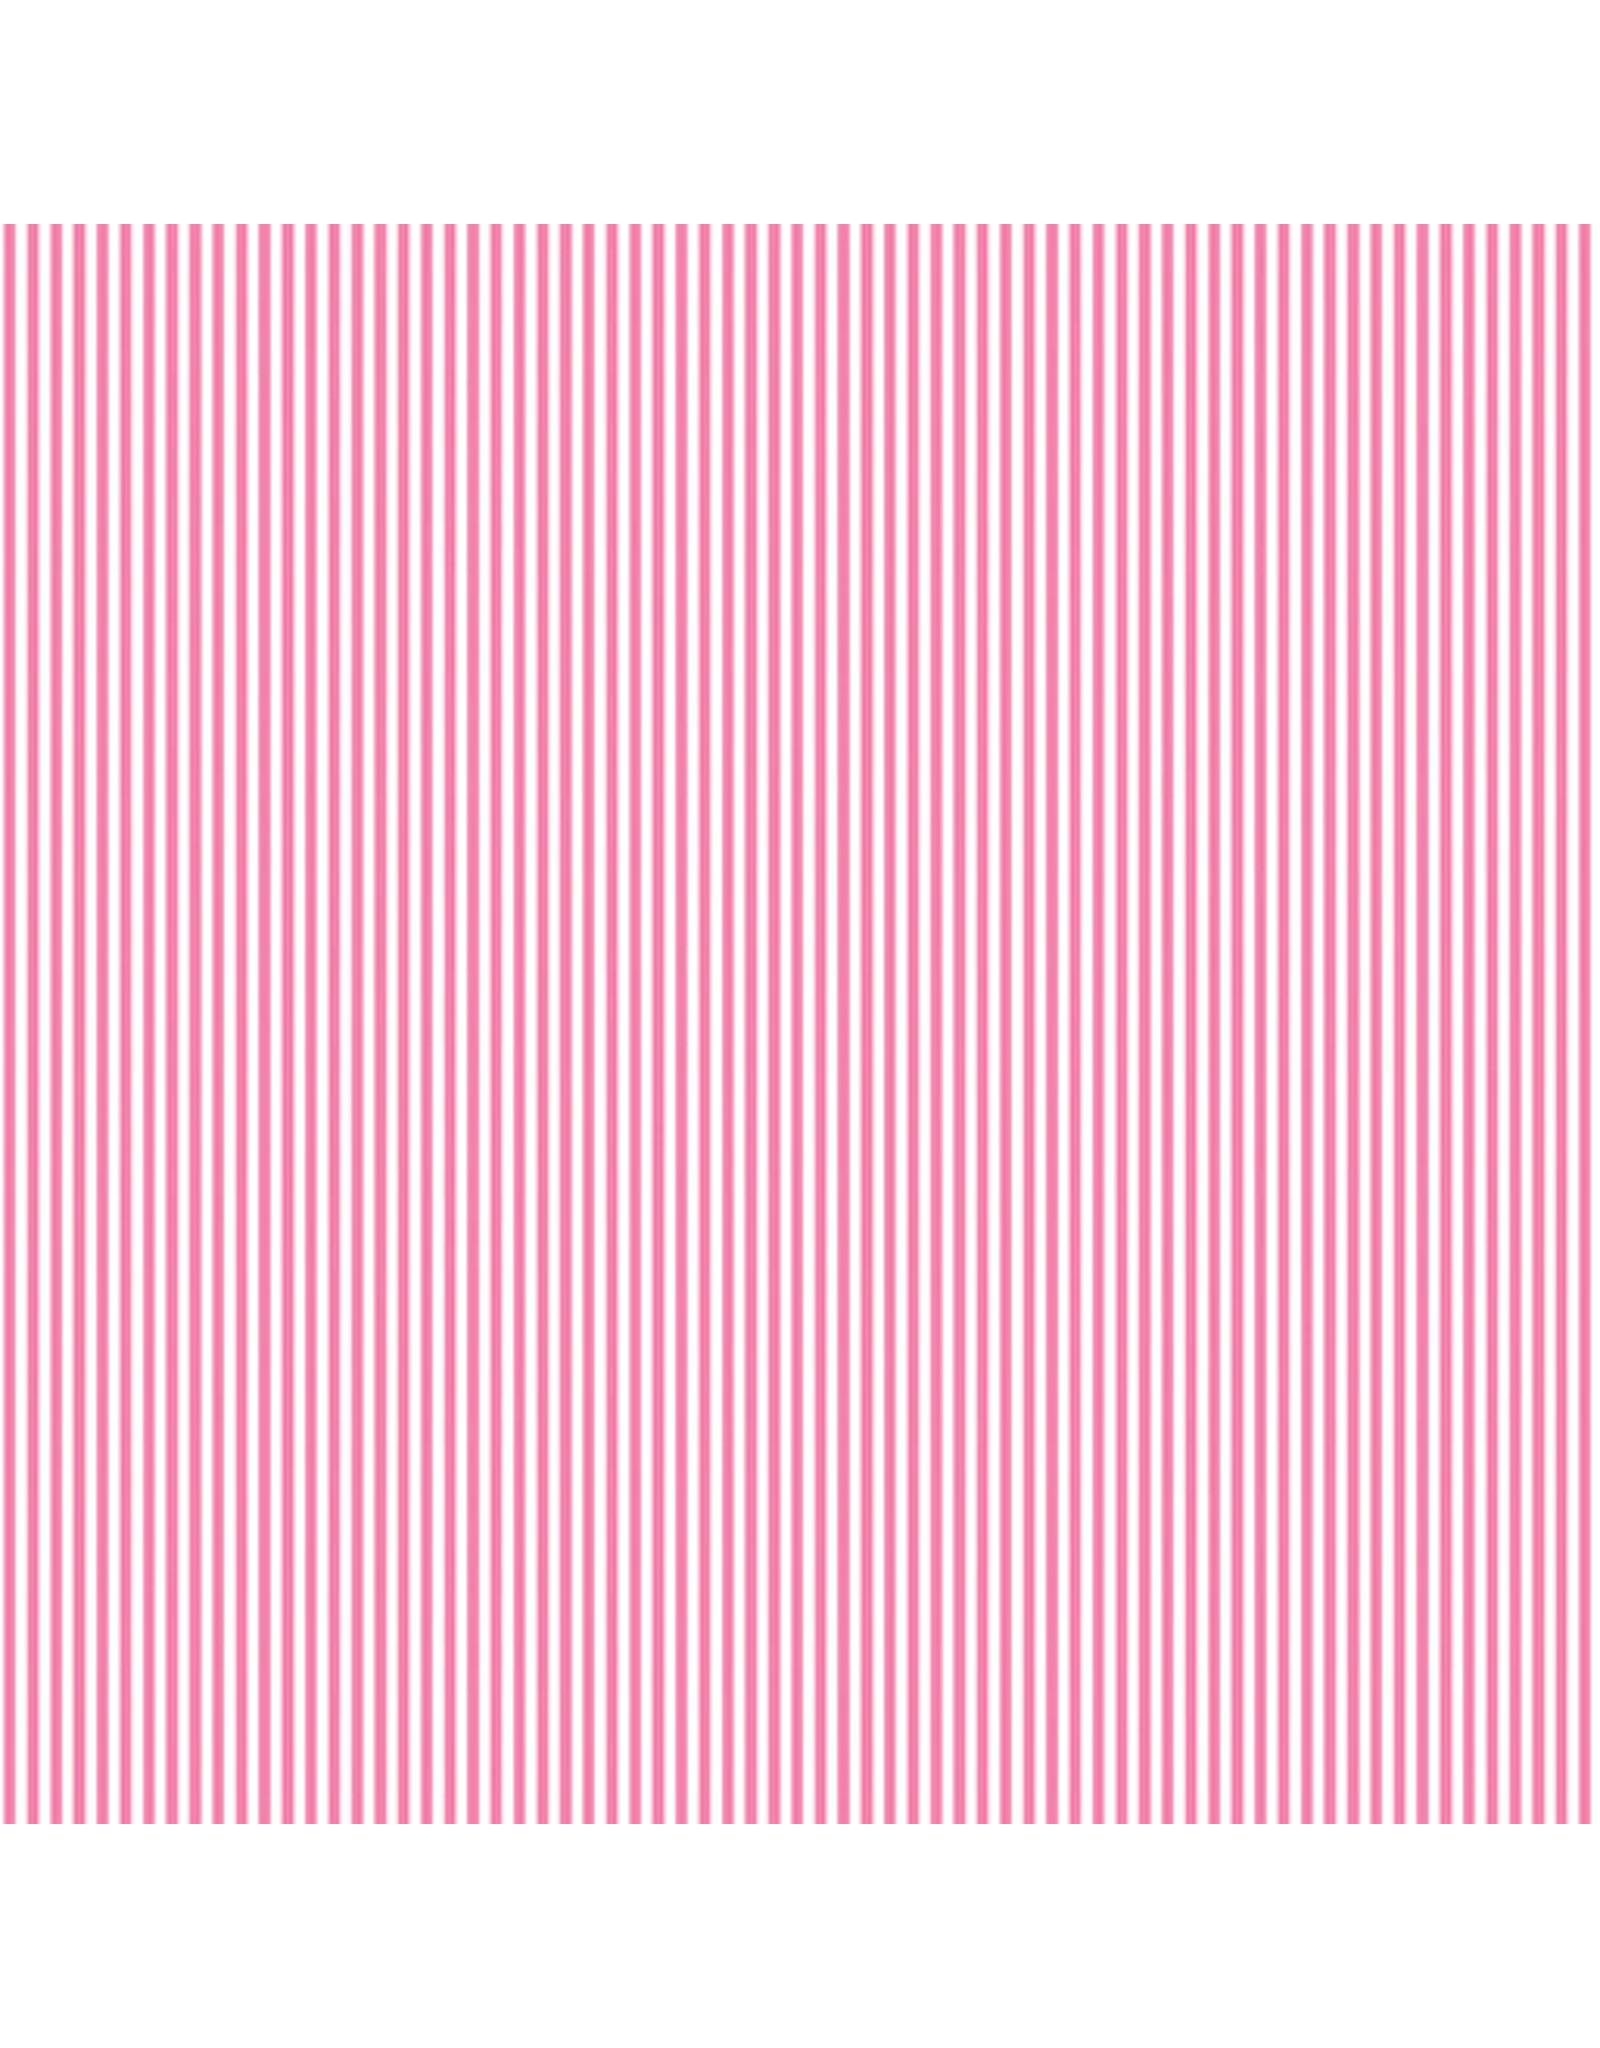 Contempo My Little Sunshine 2 - Pinstripe Pink